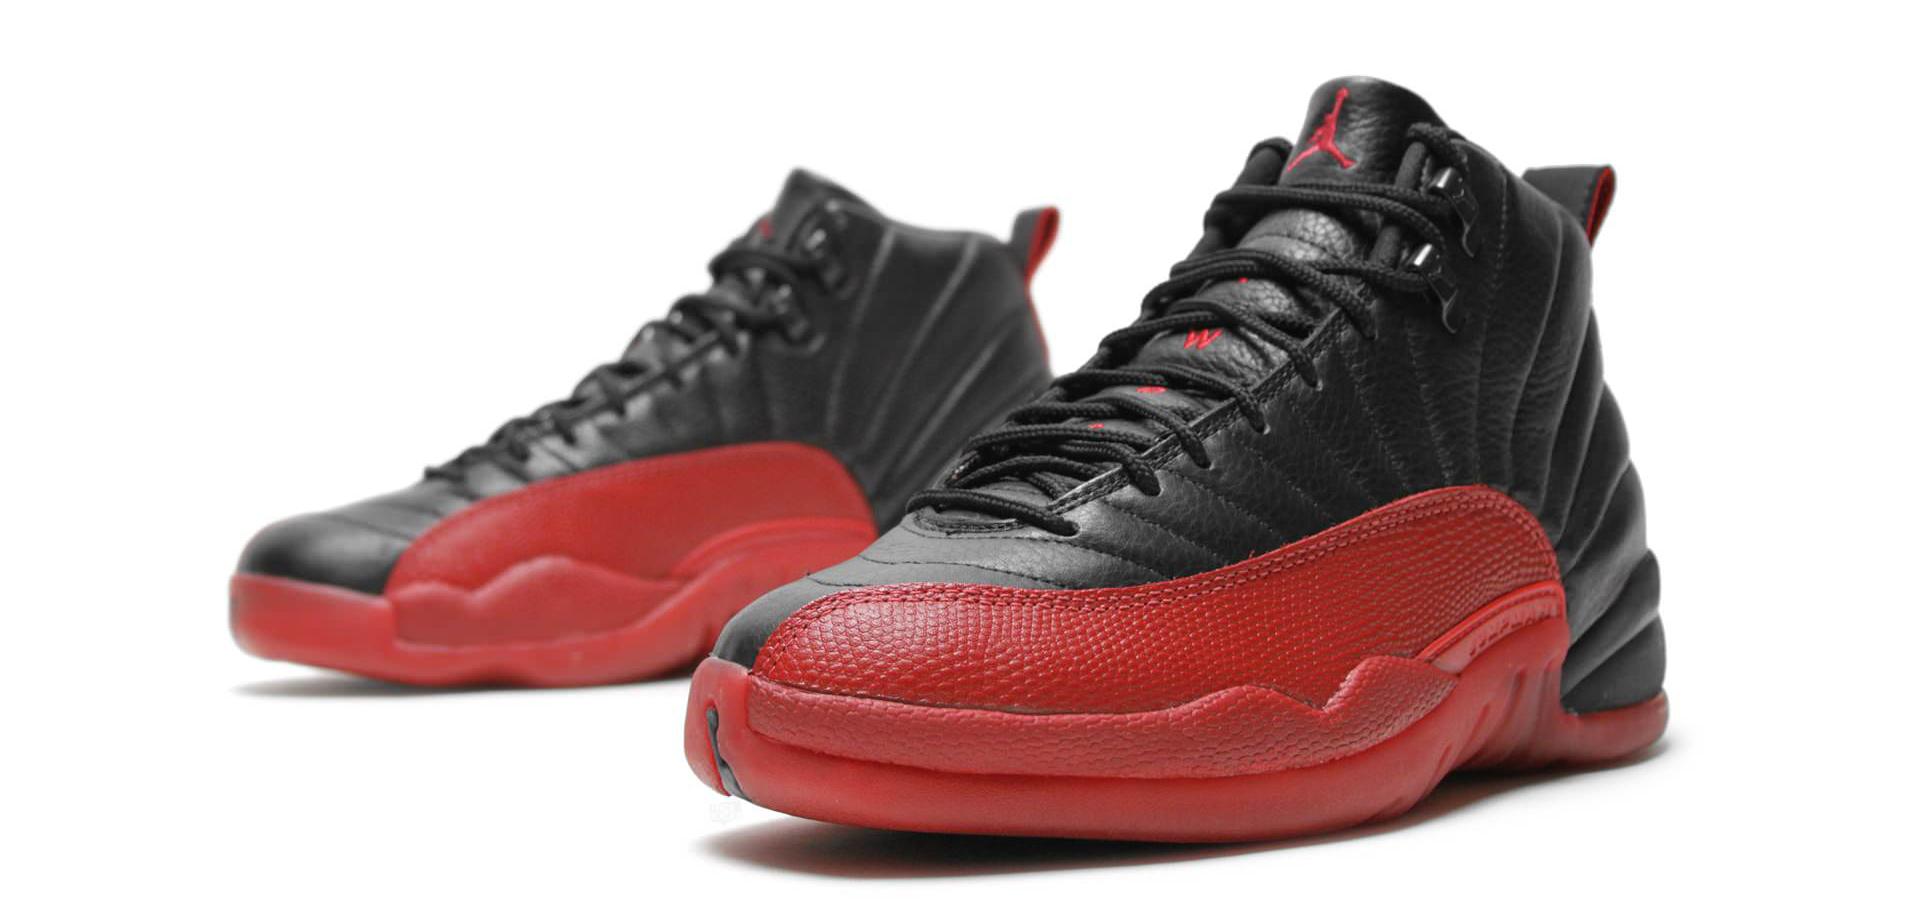 0508ee087129bf Air Jordan 12+13 Womens Red Black White shoes